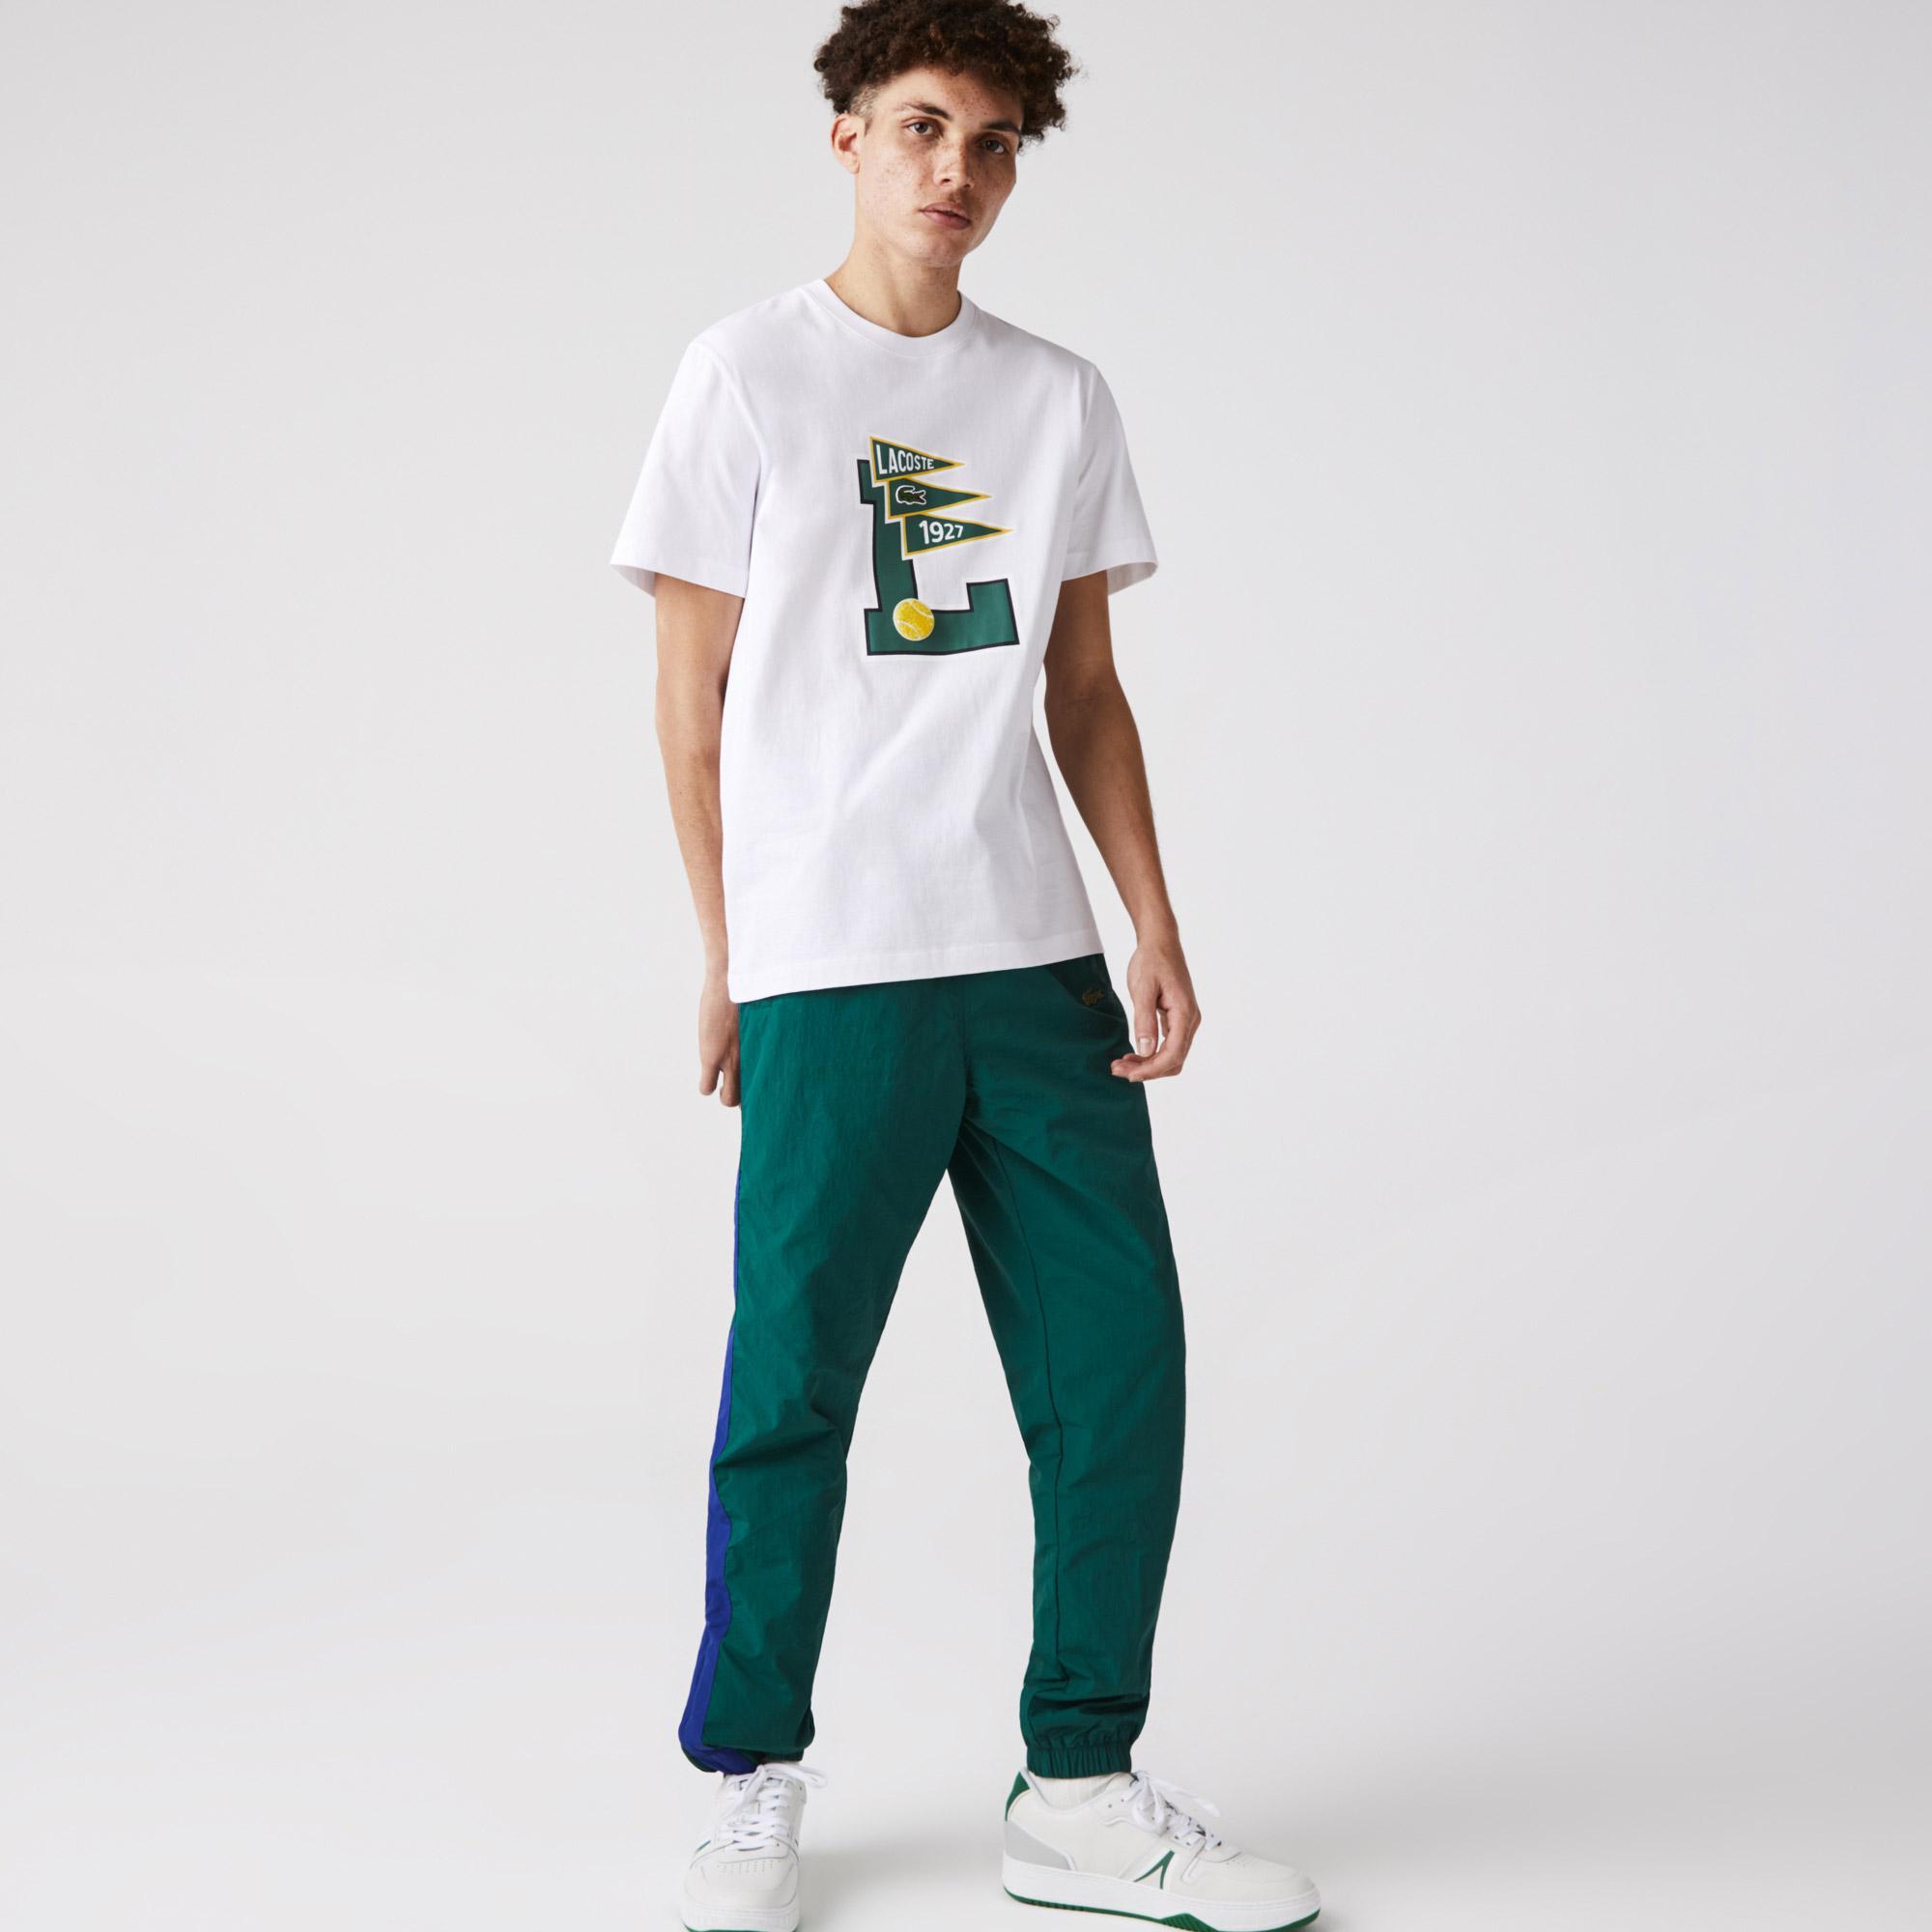 Lacoste Męski T-shirt bawełniany z okrągłym dekoltem, L Badge Pennants